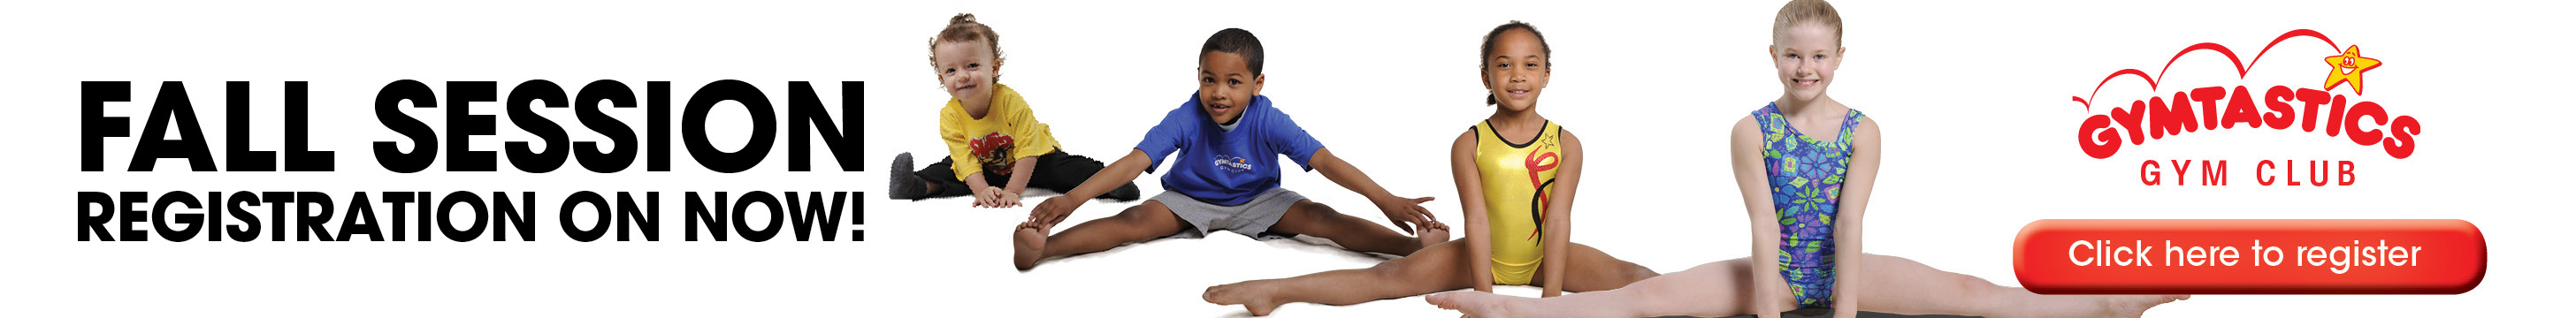 Gymnastics Sept 2016